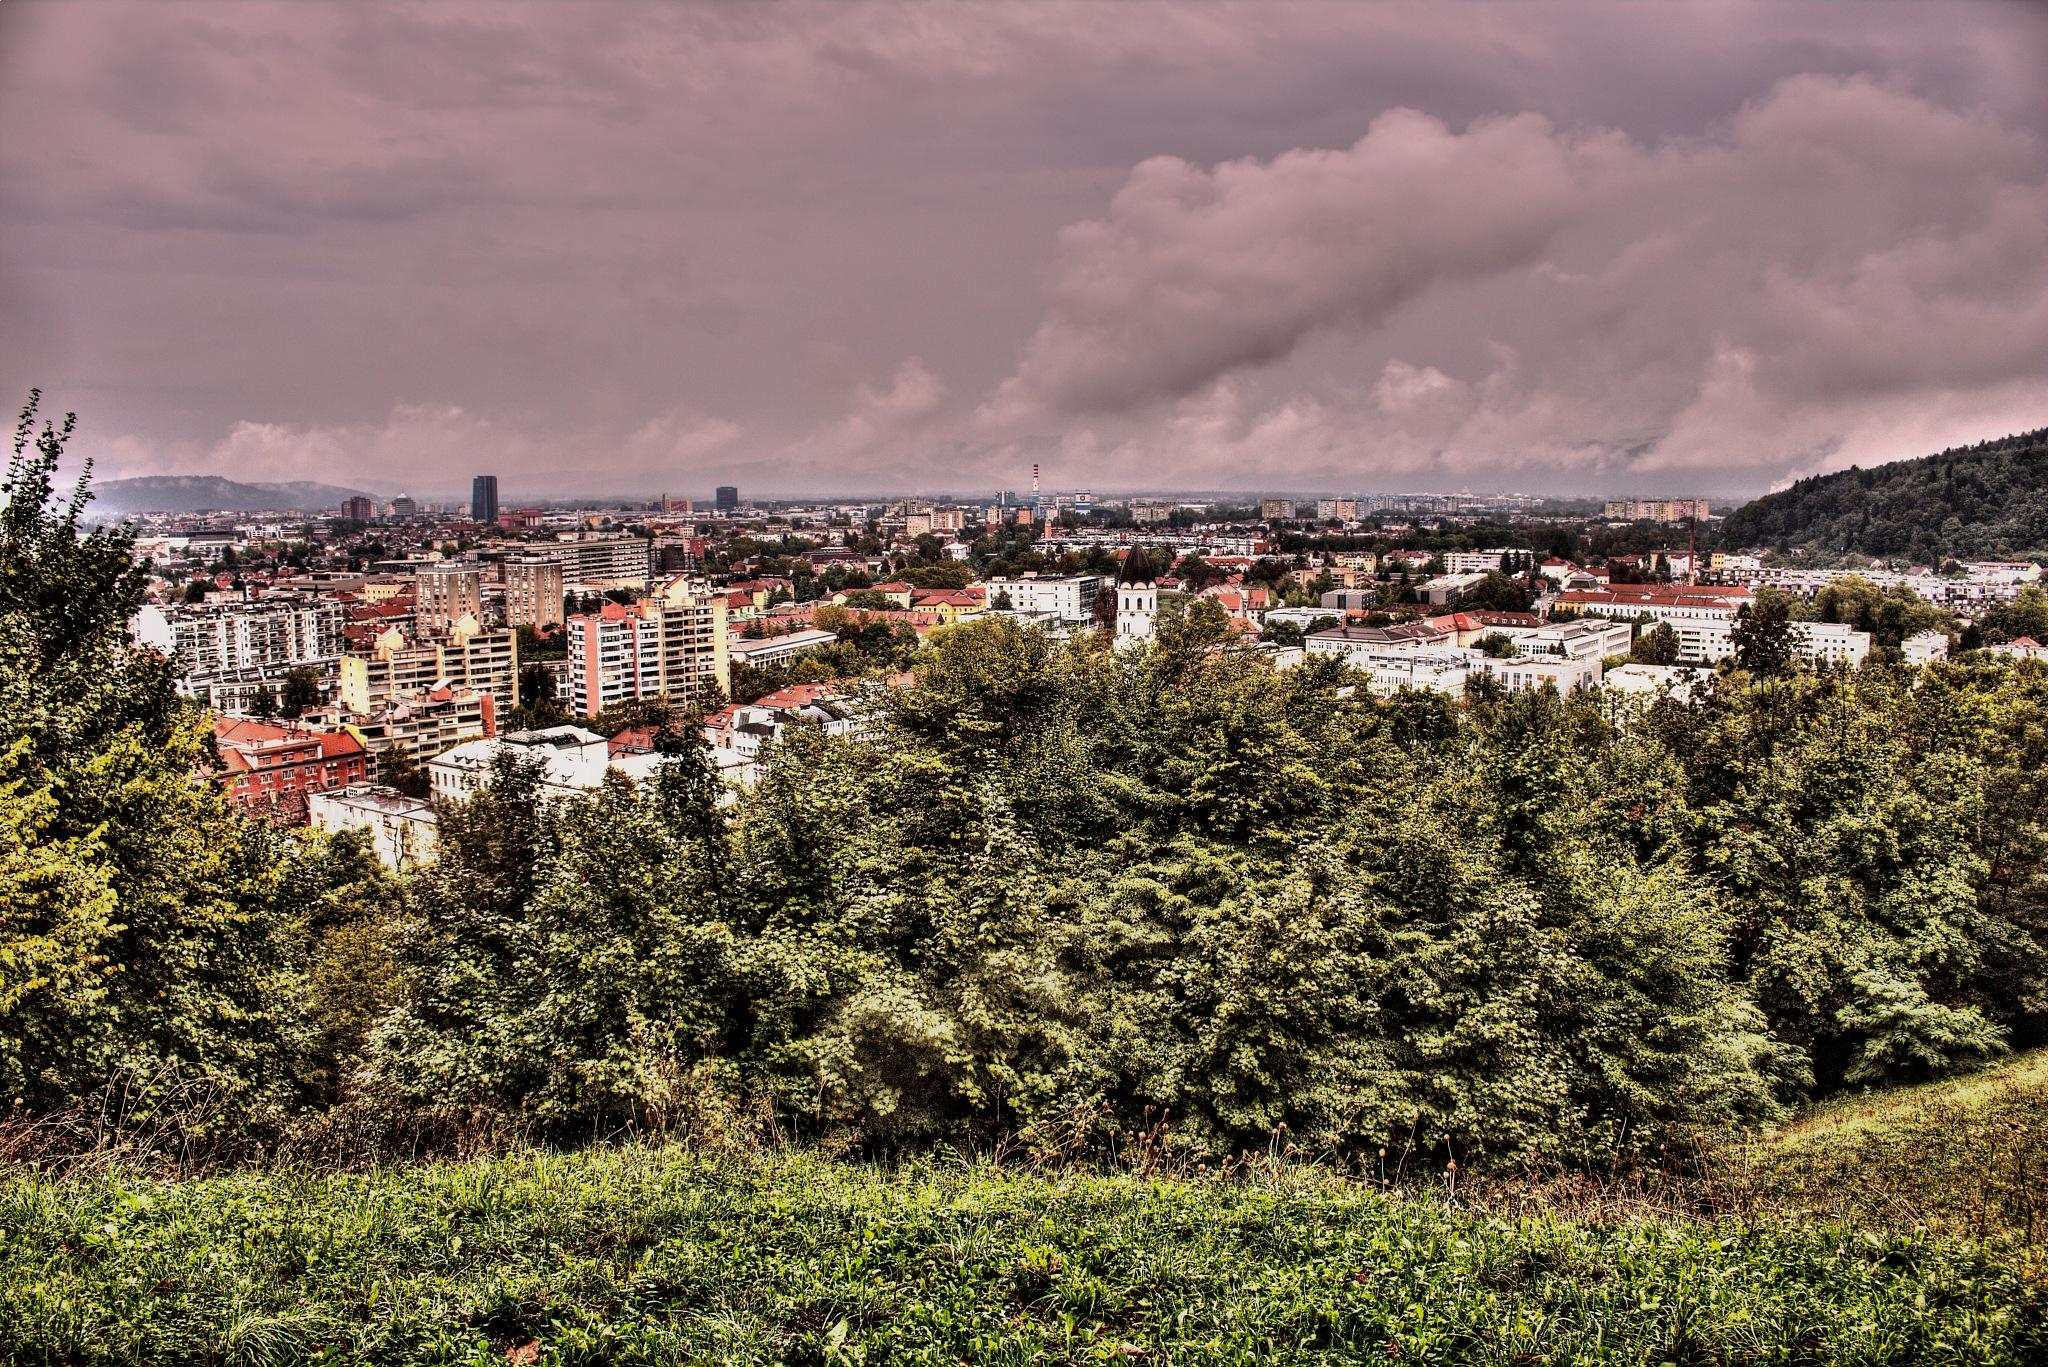 View of the rainy city of Ljubljana by zvnktomasevic